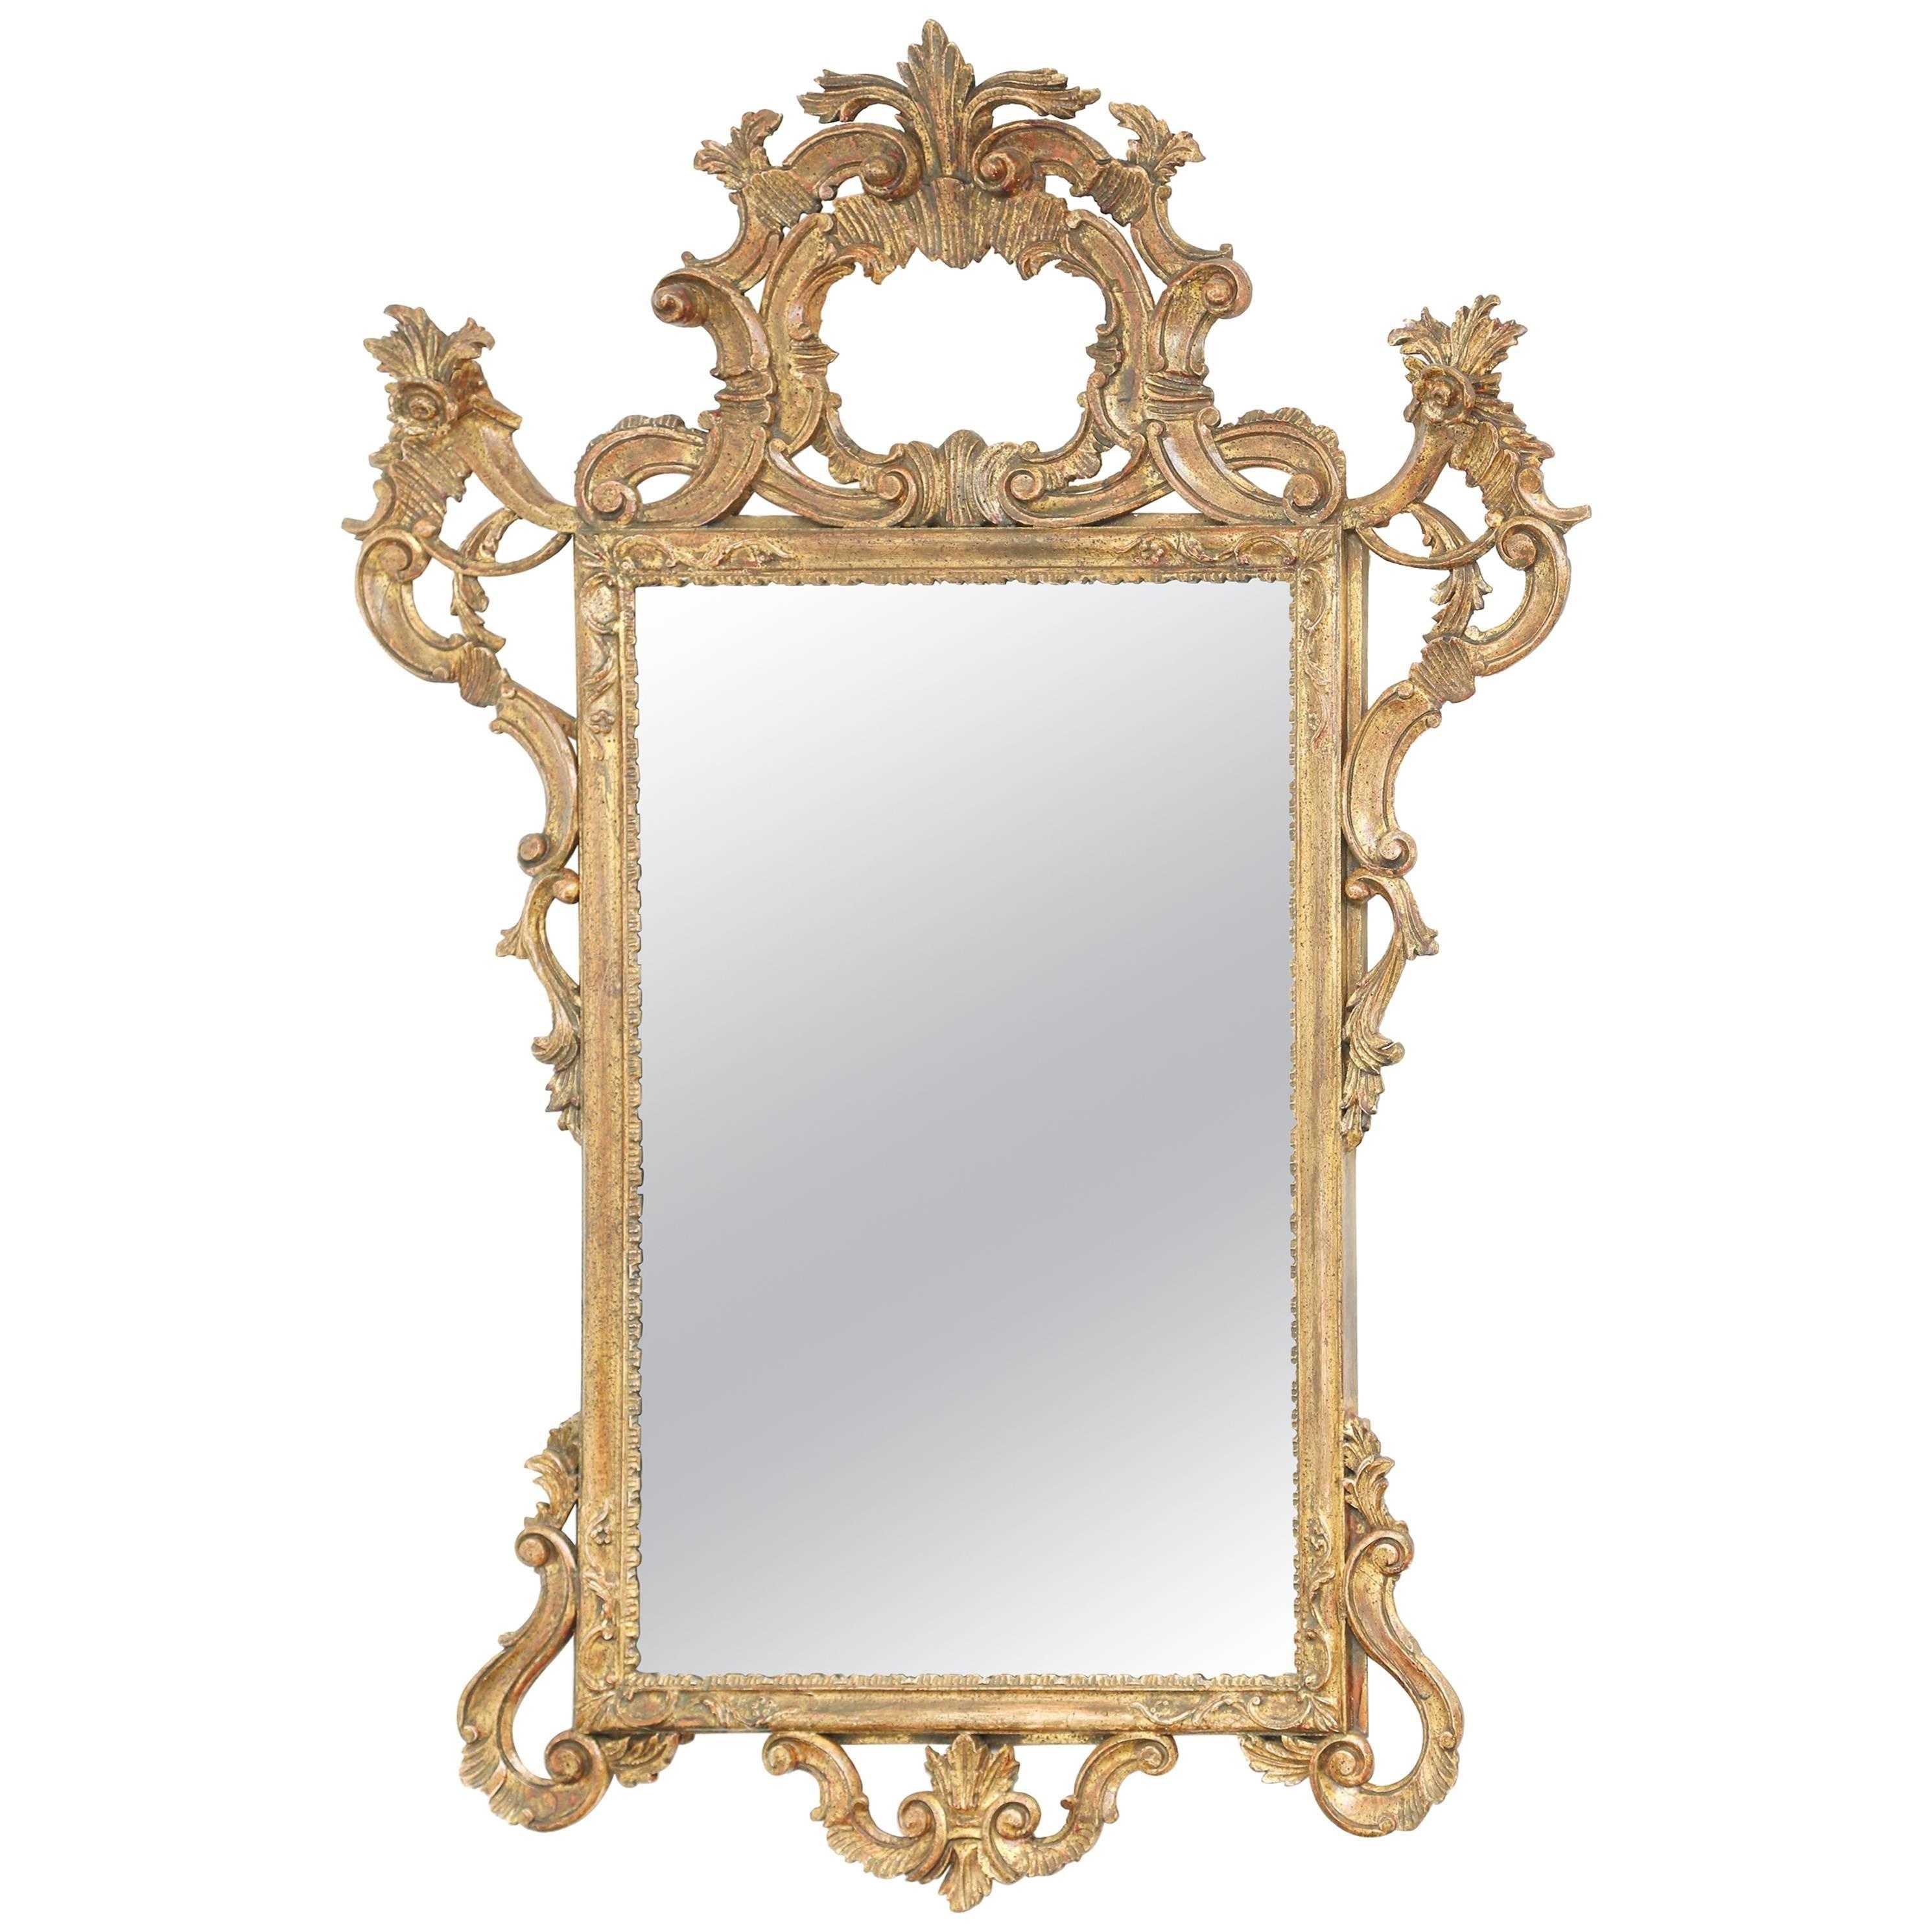 Carved Giltwood Italian Rococo Mirror